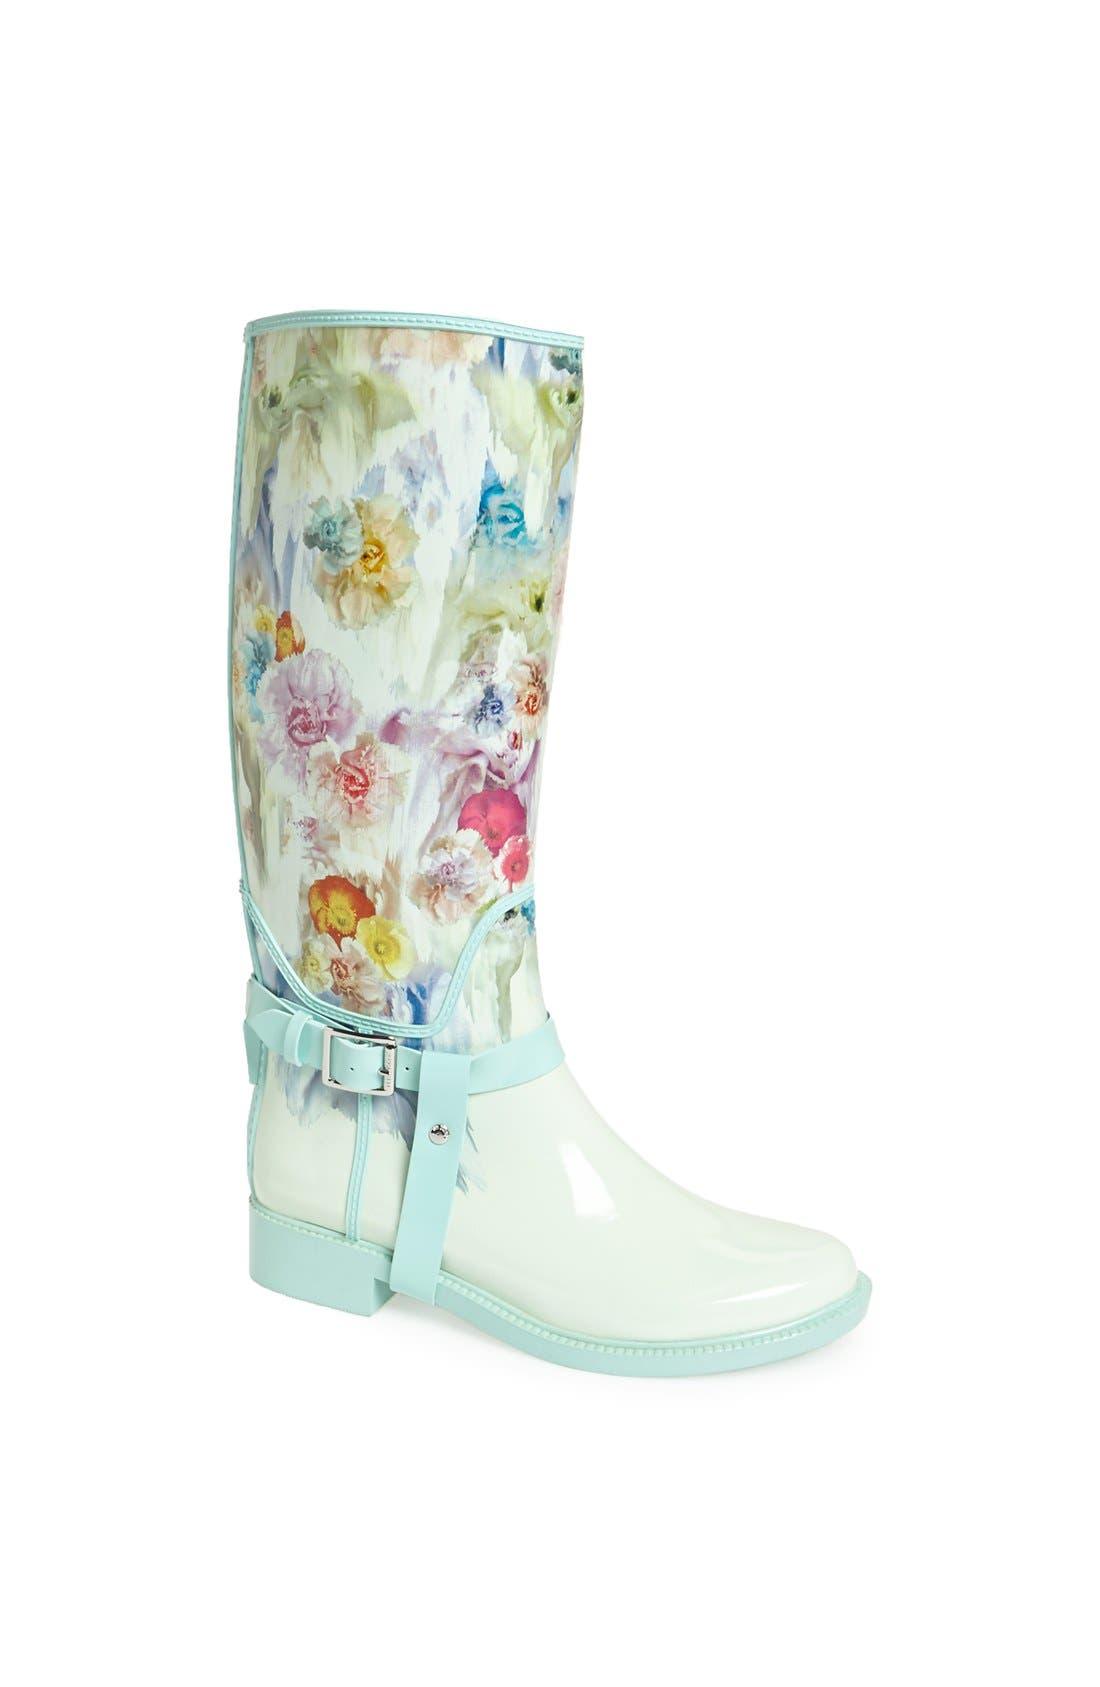 Alternate Image 1 Selected - Ted Baker London 'Atiri' Rain Boot (Women)